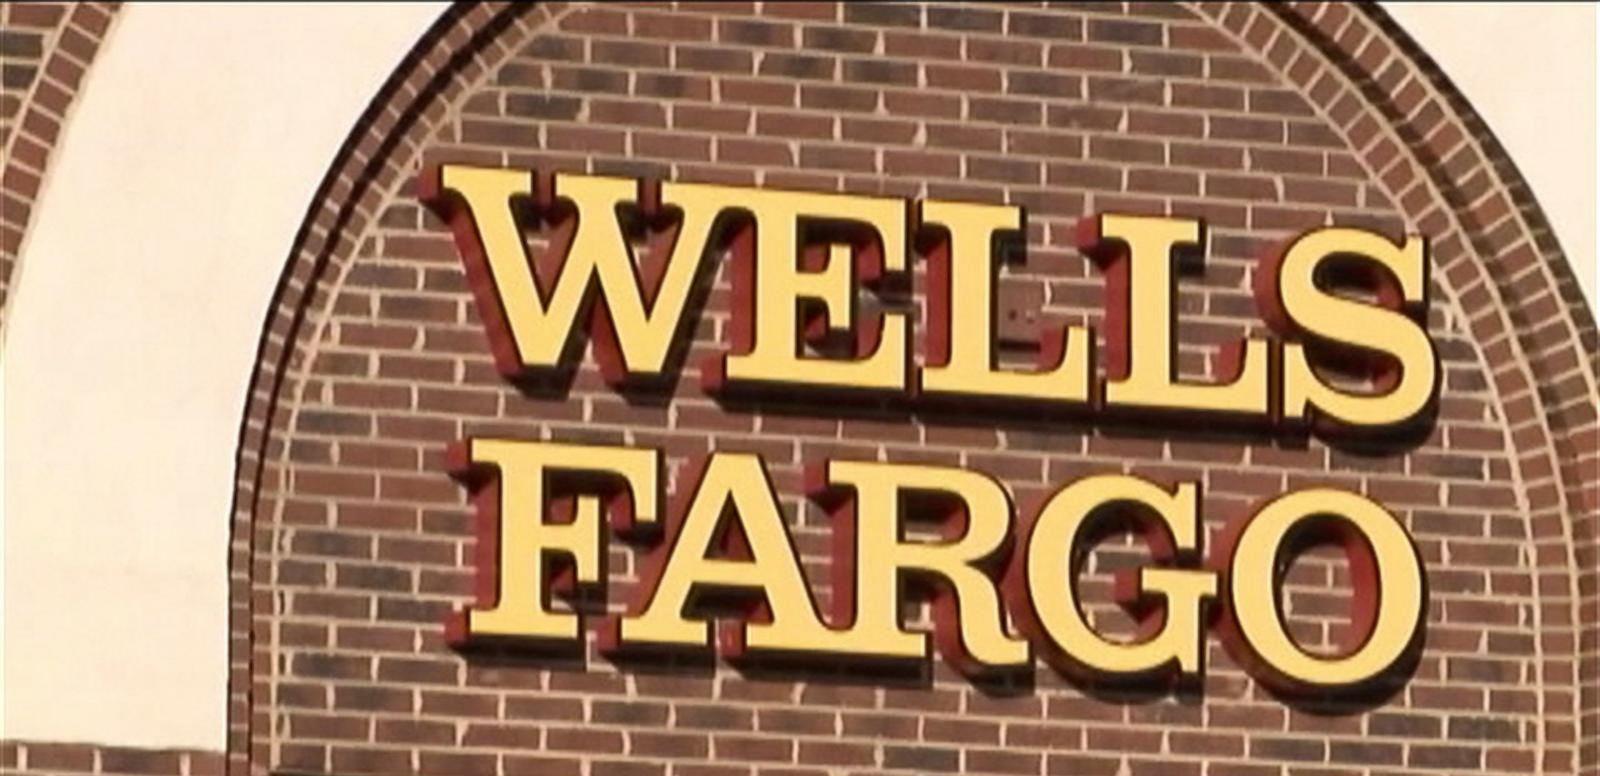 VIDEO: Wells Fargo Accused of Fraud, Taking Advantage of Customers